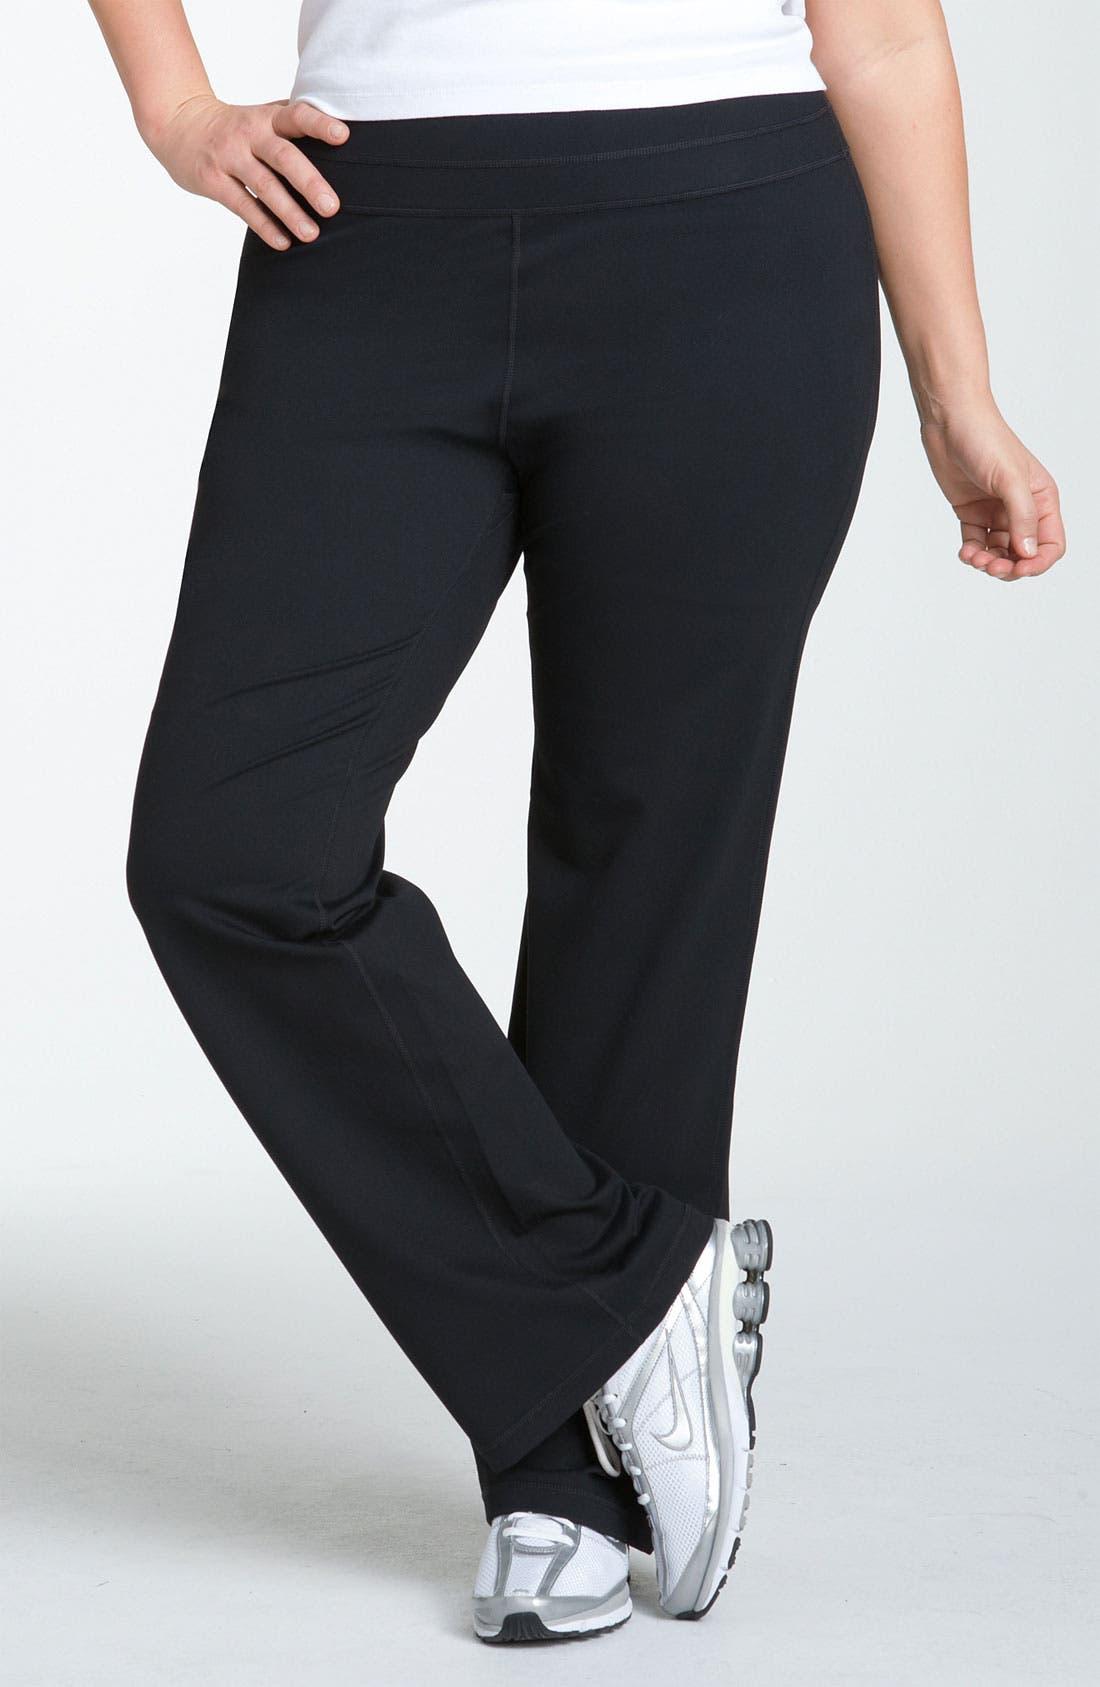 Alternate Image 1 Selected - Zella 'Booty' Reversible Pants (Plus Size)